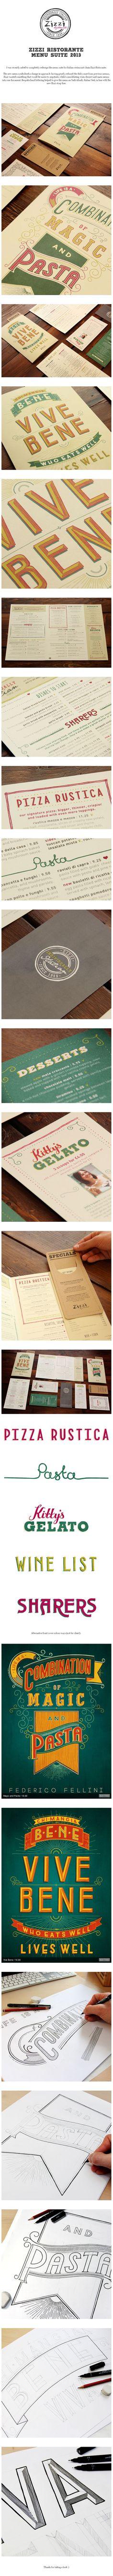 Redesign the menu suite for Italian restaurant chain Zizzi Ristorante. #Typo #restaurant #lettering via: Behance.net. Uploaded by: http://pinterest.com/zoeindesign/